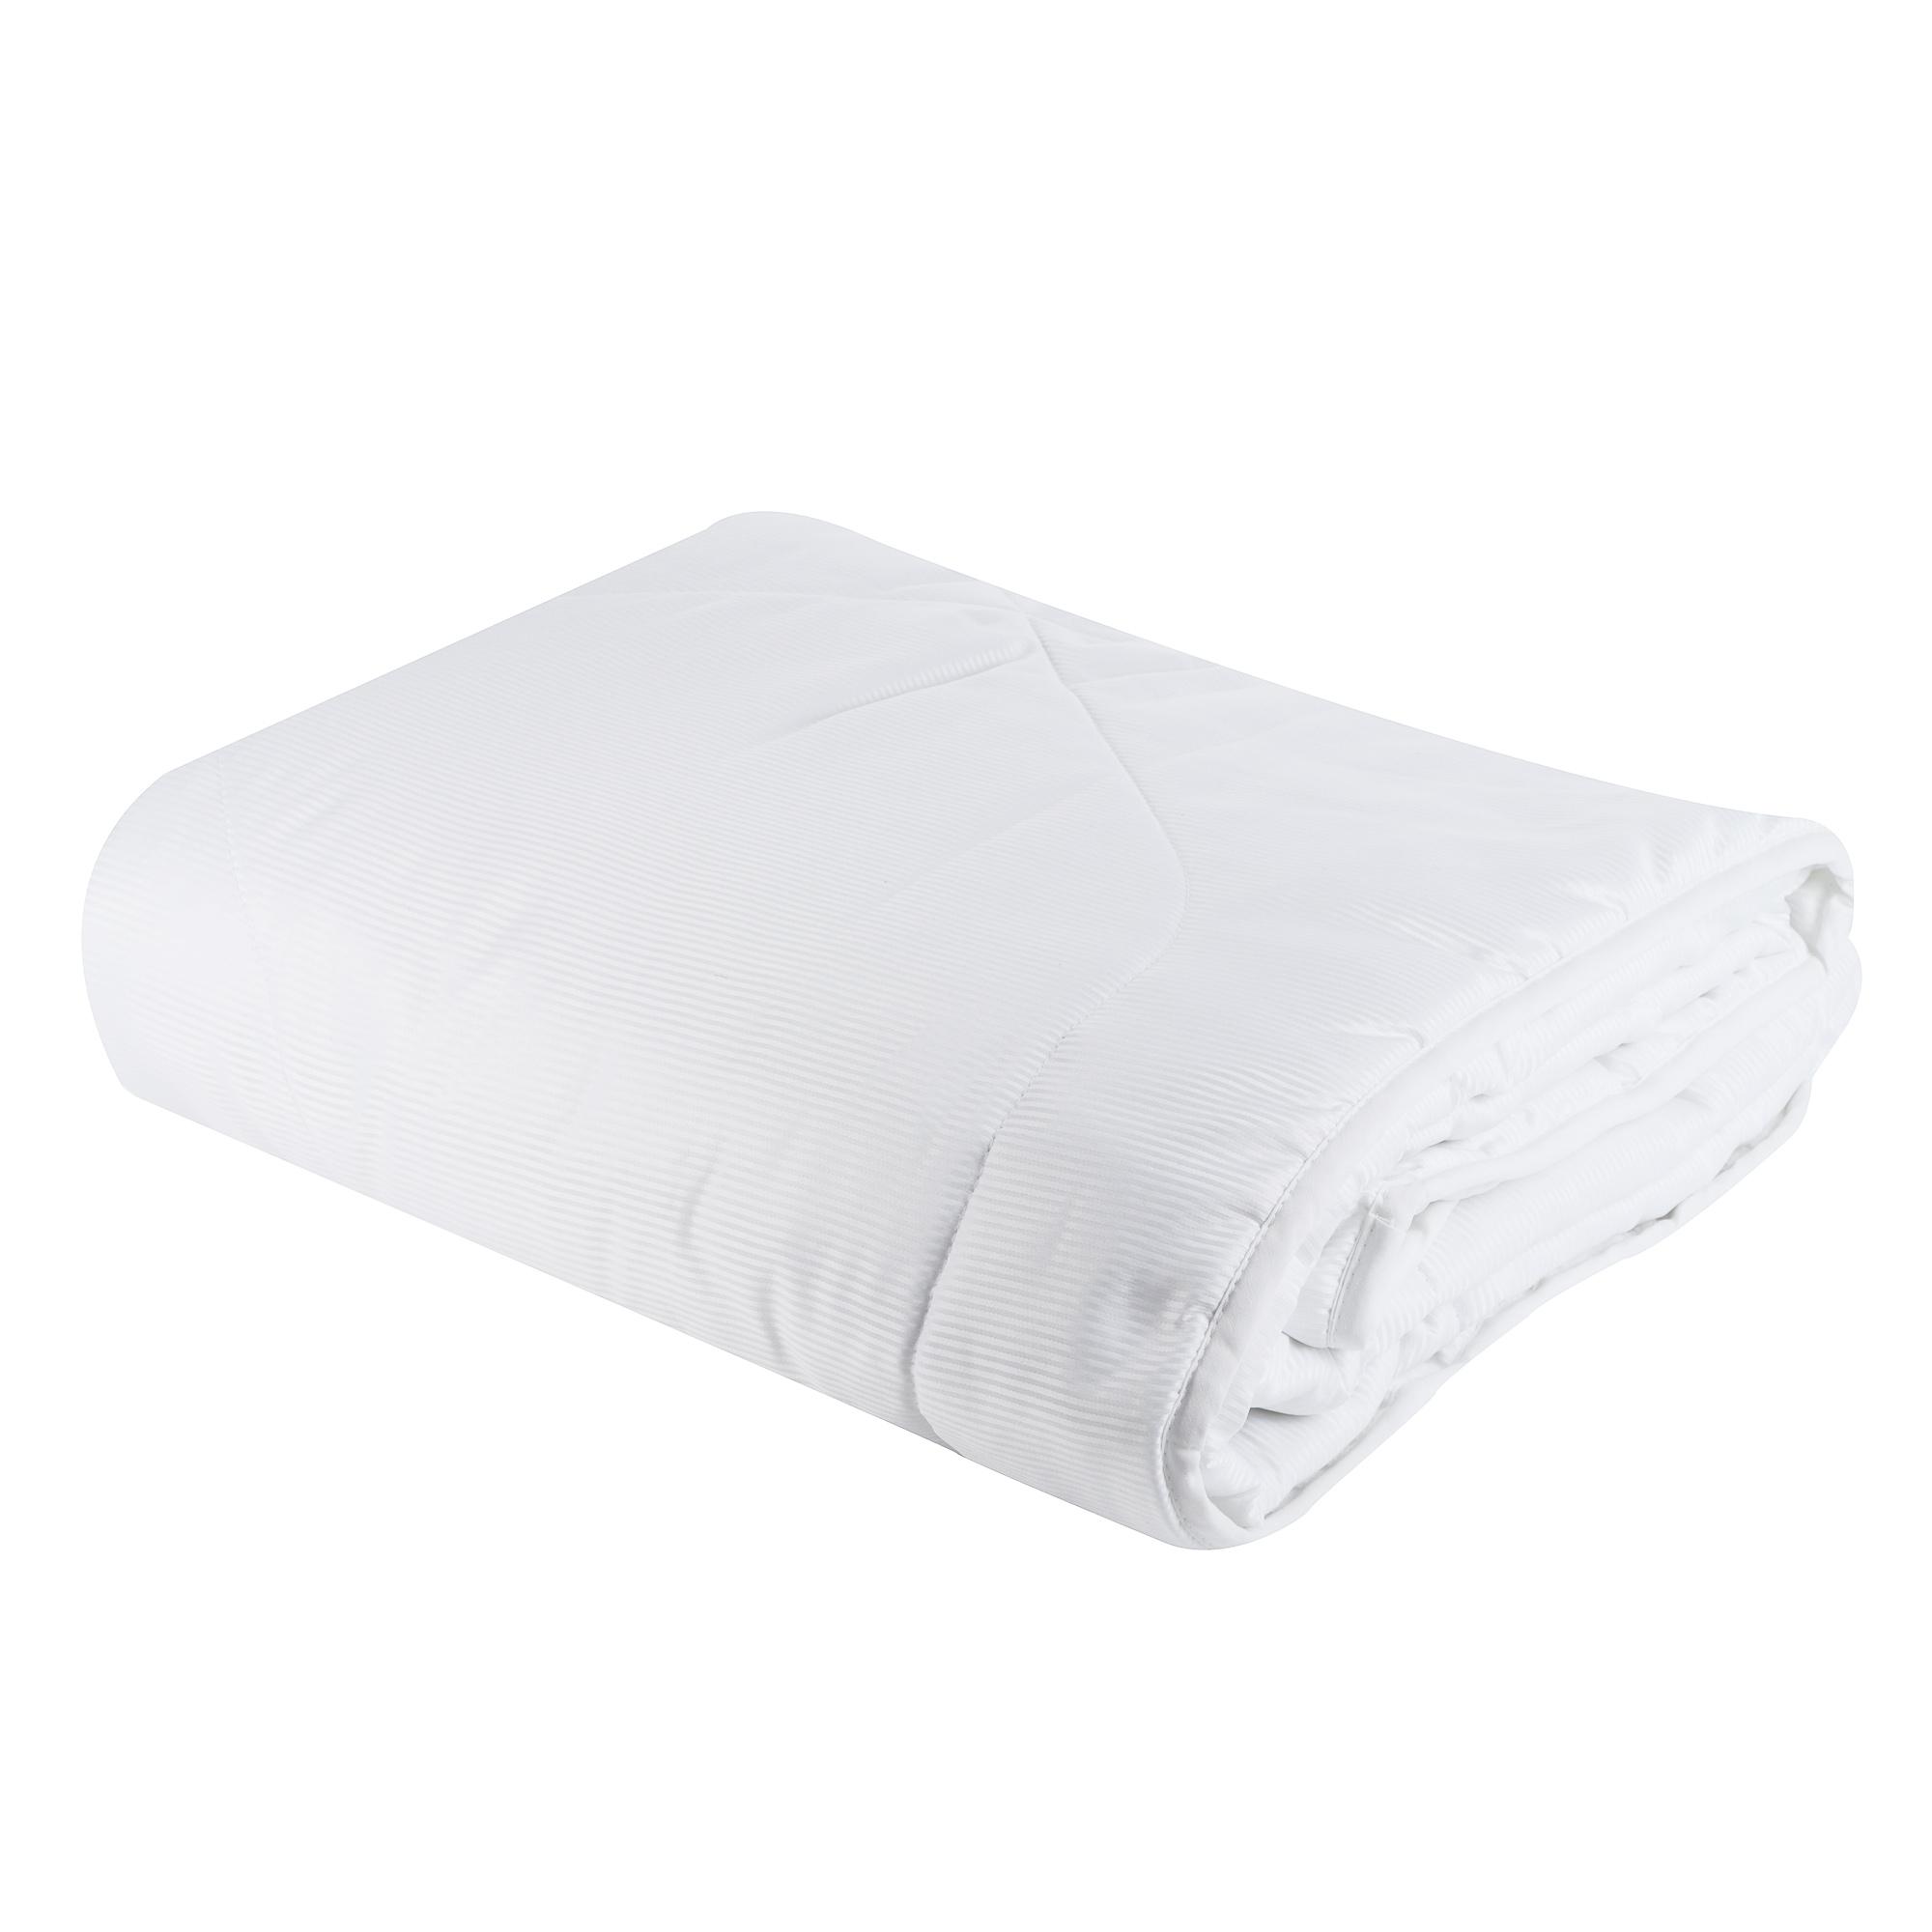 Одеяло estia wool dreams 200х210 см